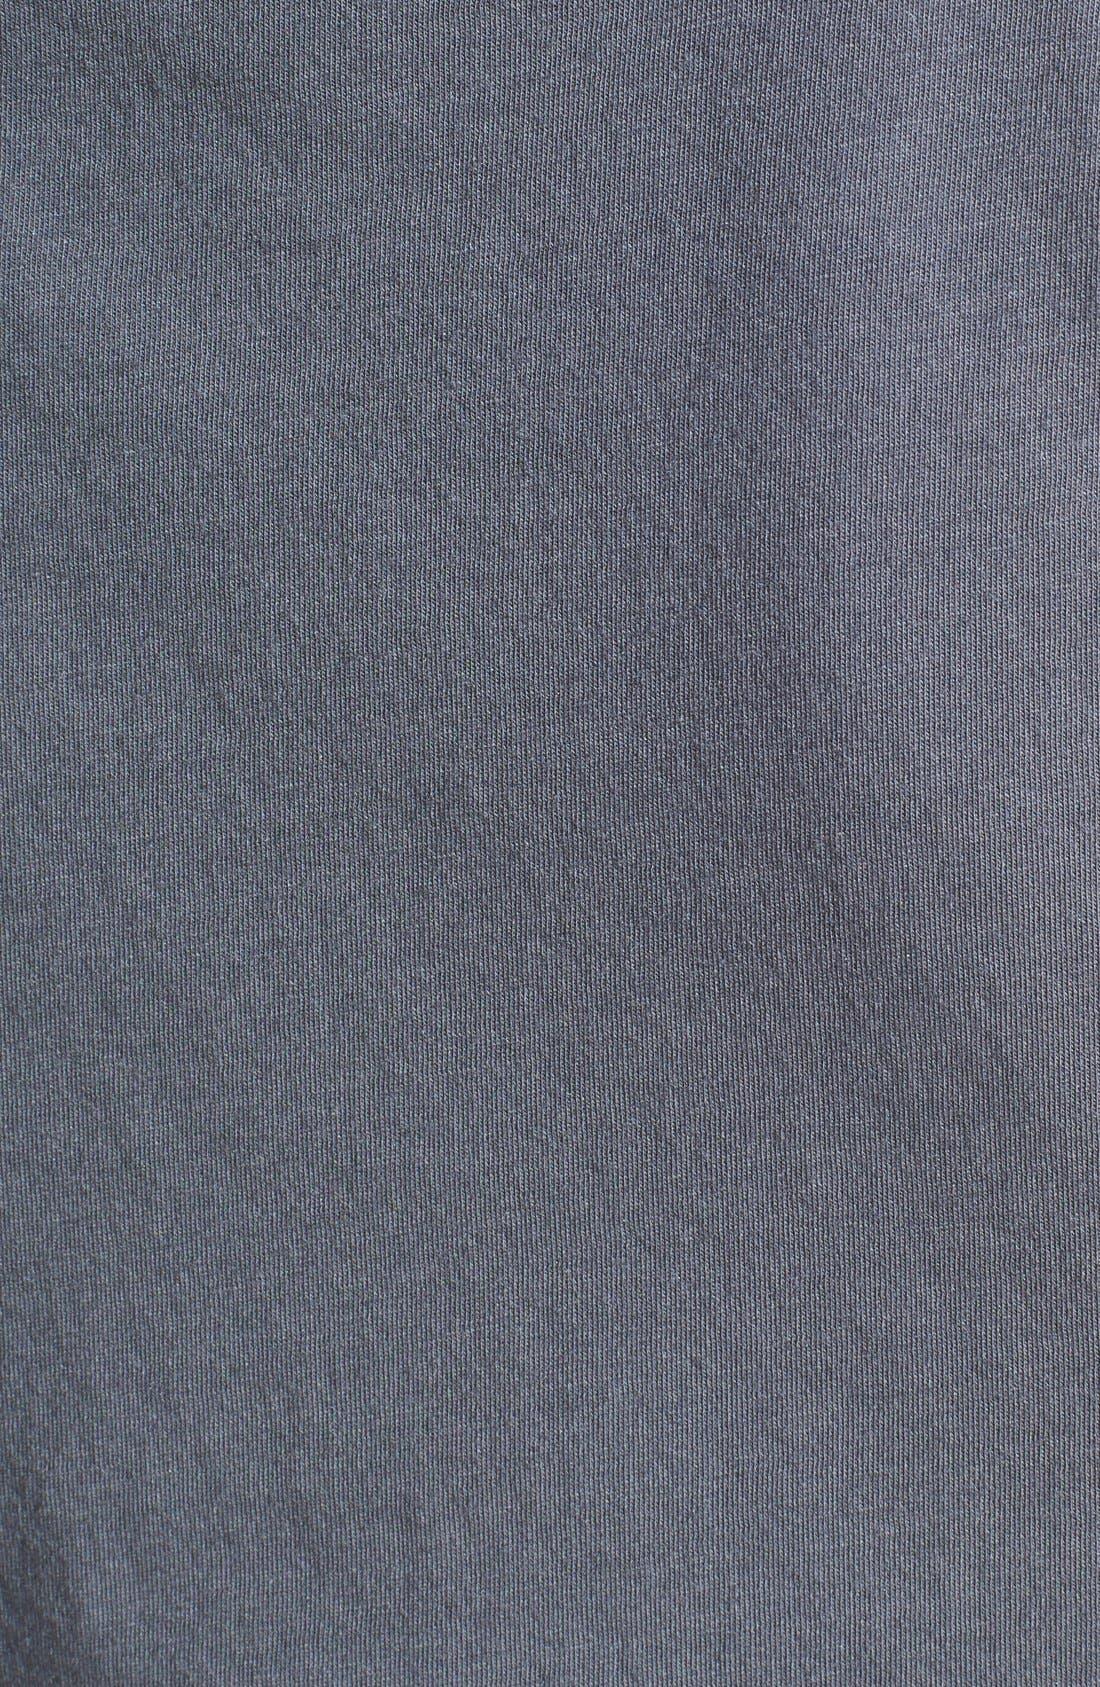 Alternate Image 3  - Vince Short Sleeve V-Neck Tee